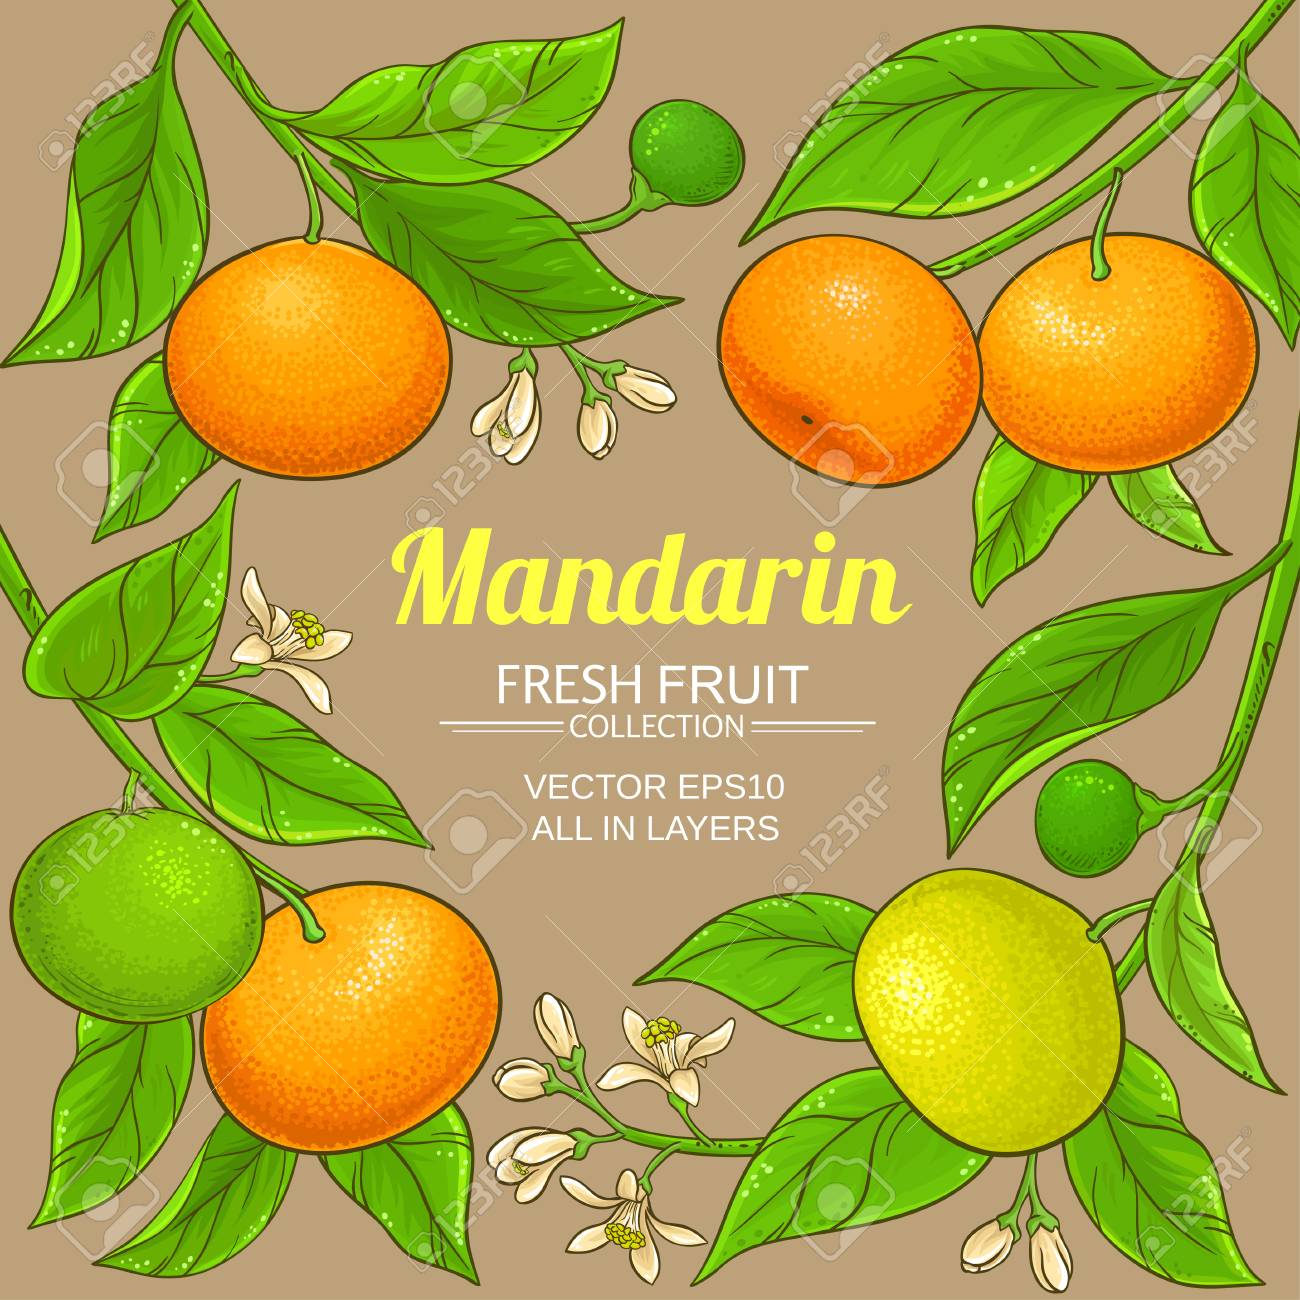 mandarin vector frame - 108435441